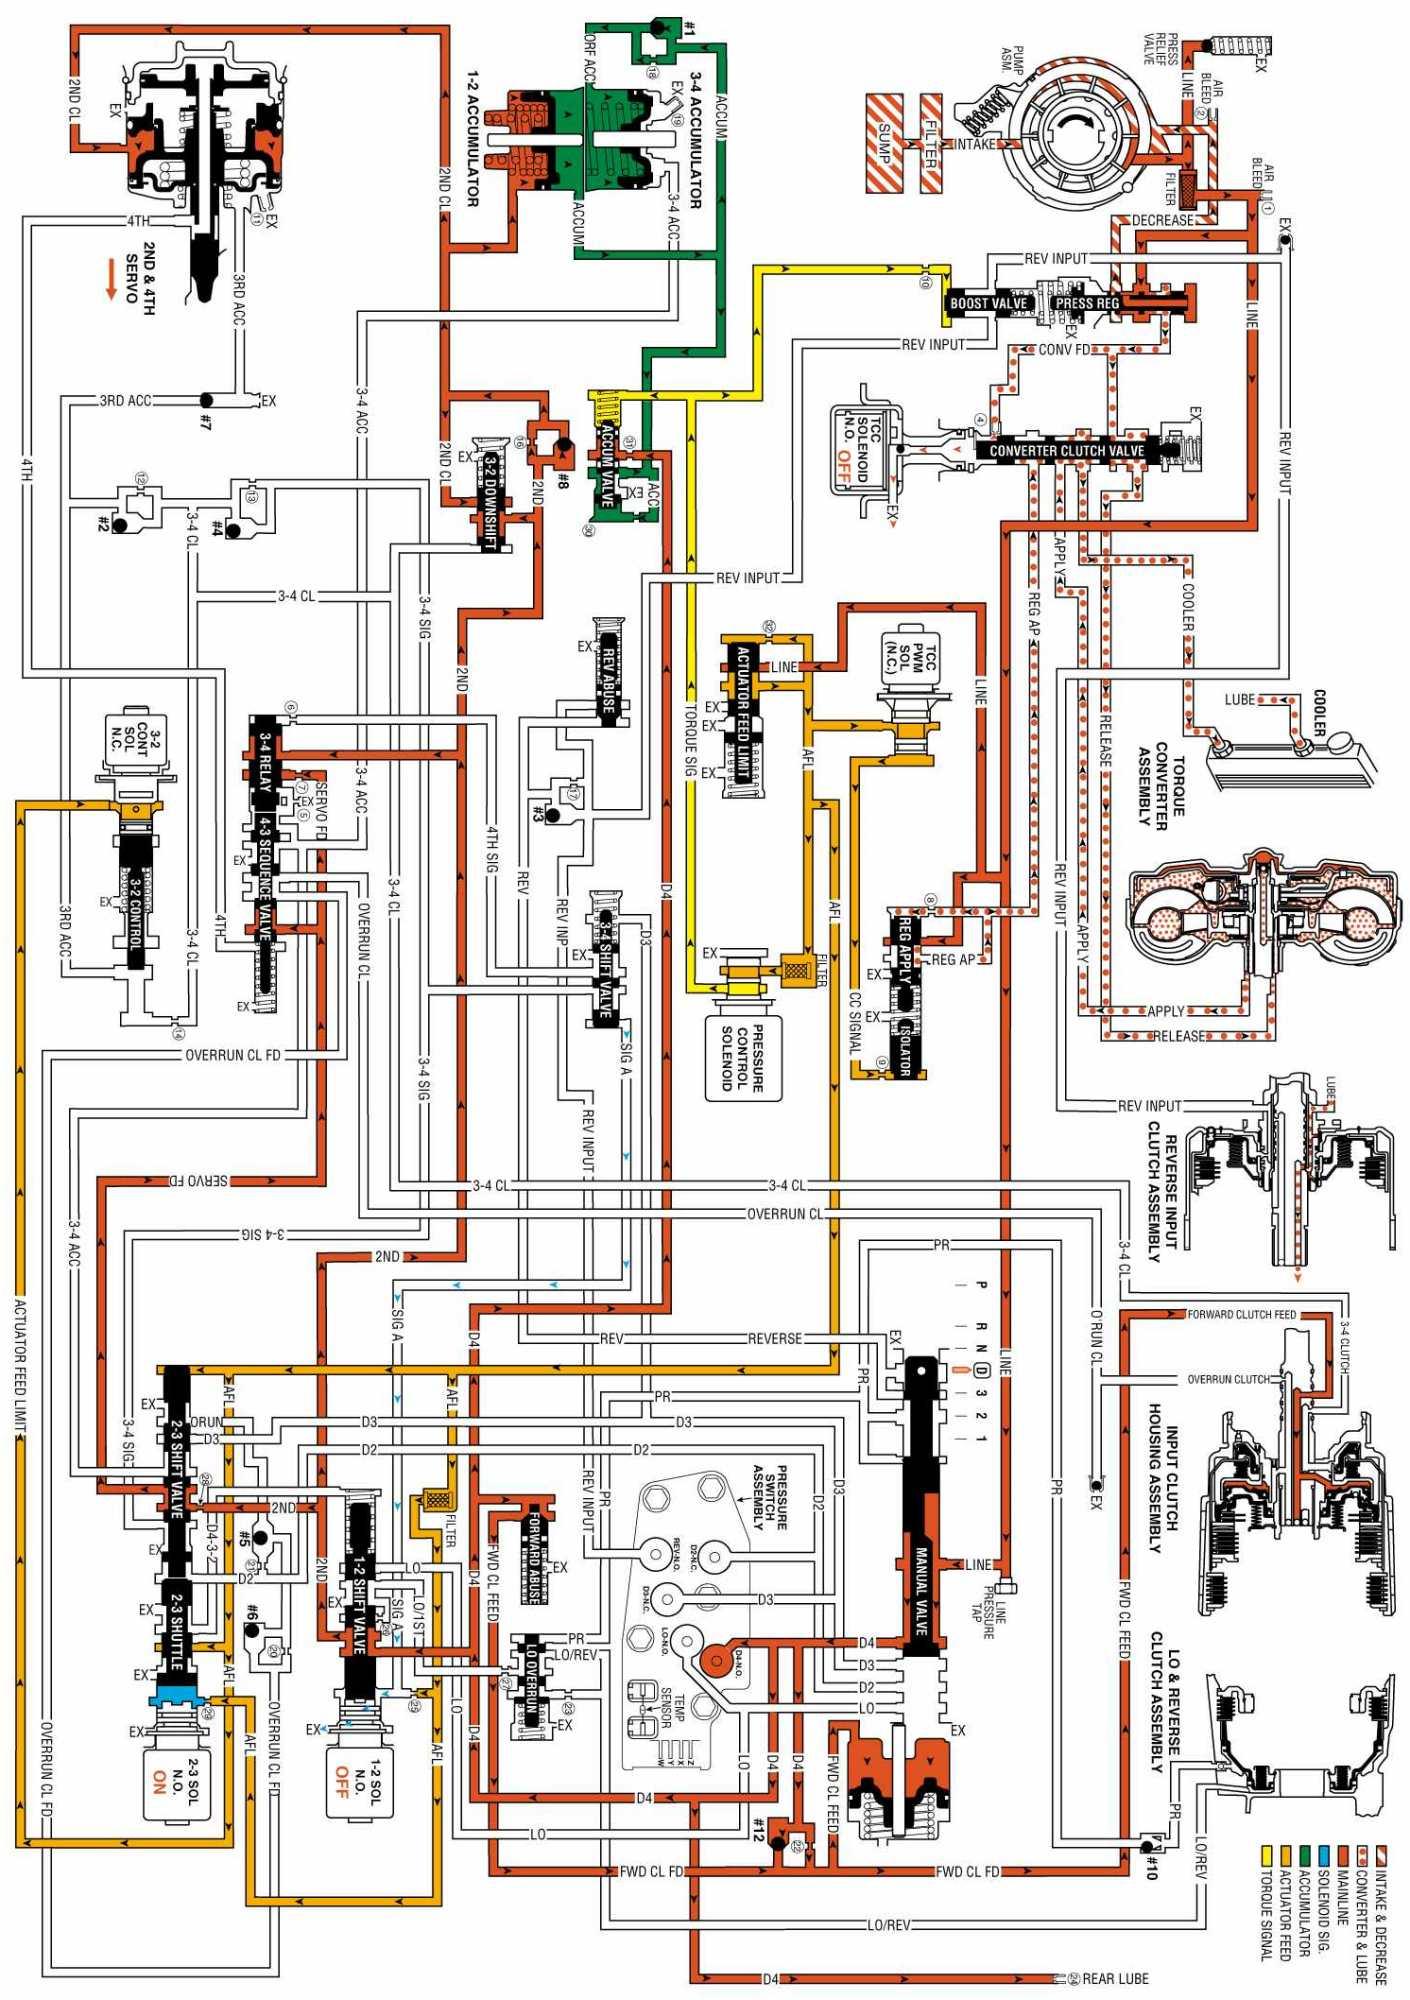 silveradosierra com u2022 2005 4l60e after rebuild issue transmissionre 2005 4l60e after rebuild issue [ 1410 x 2000 Pixel ]